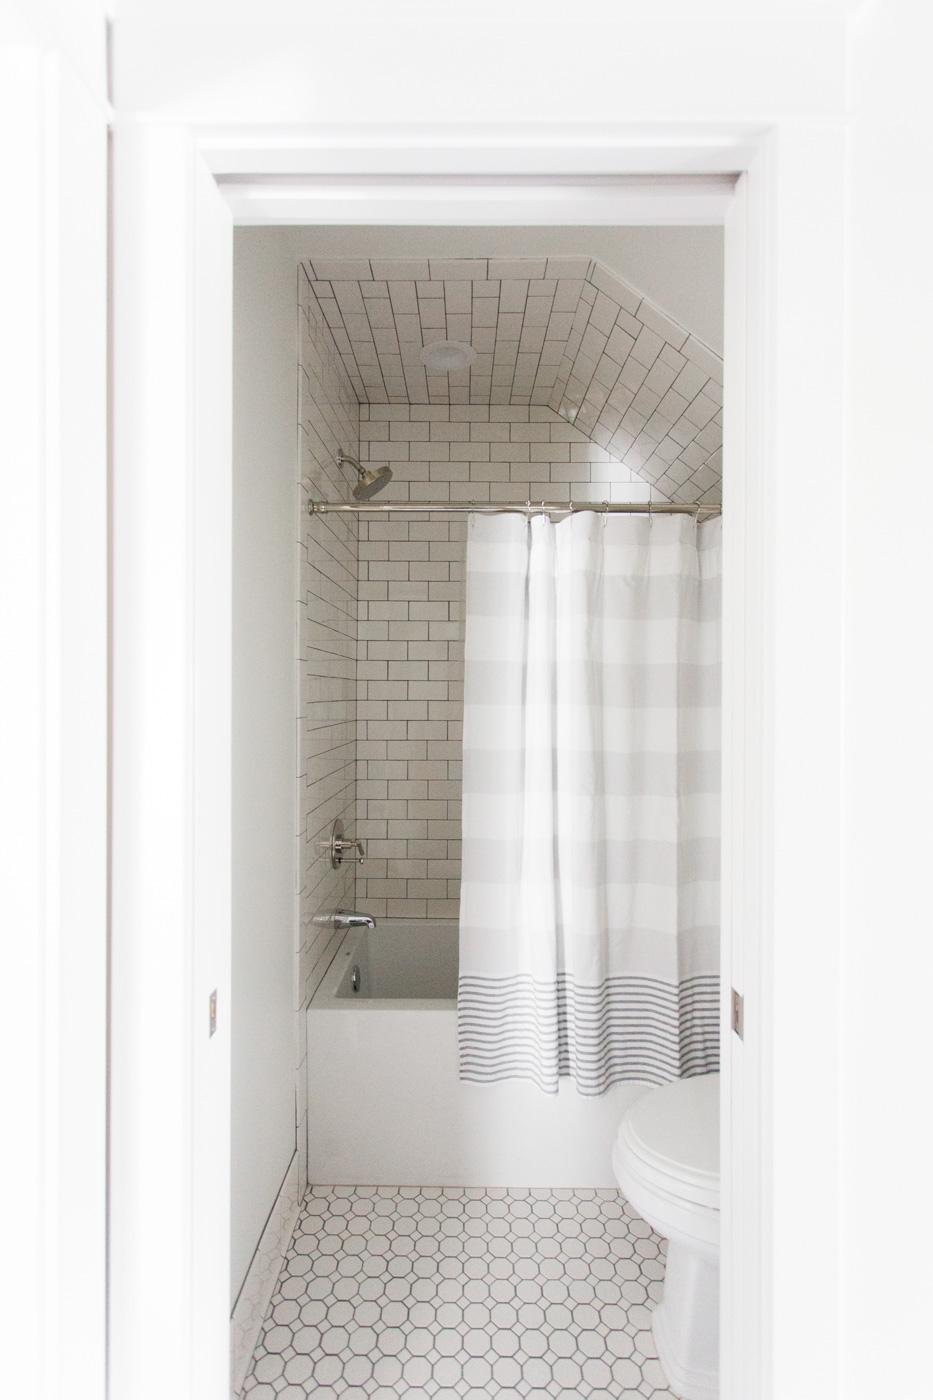 White+tile+with+dark+grout+||+Studio+McGee.jpg